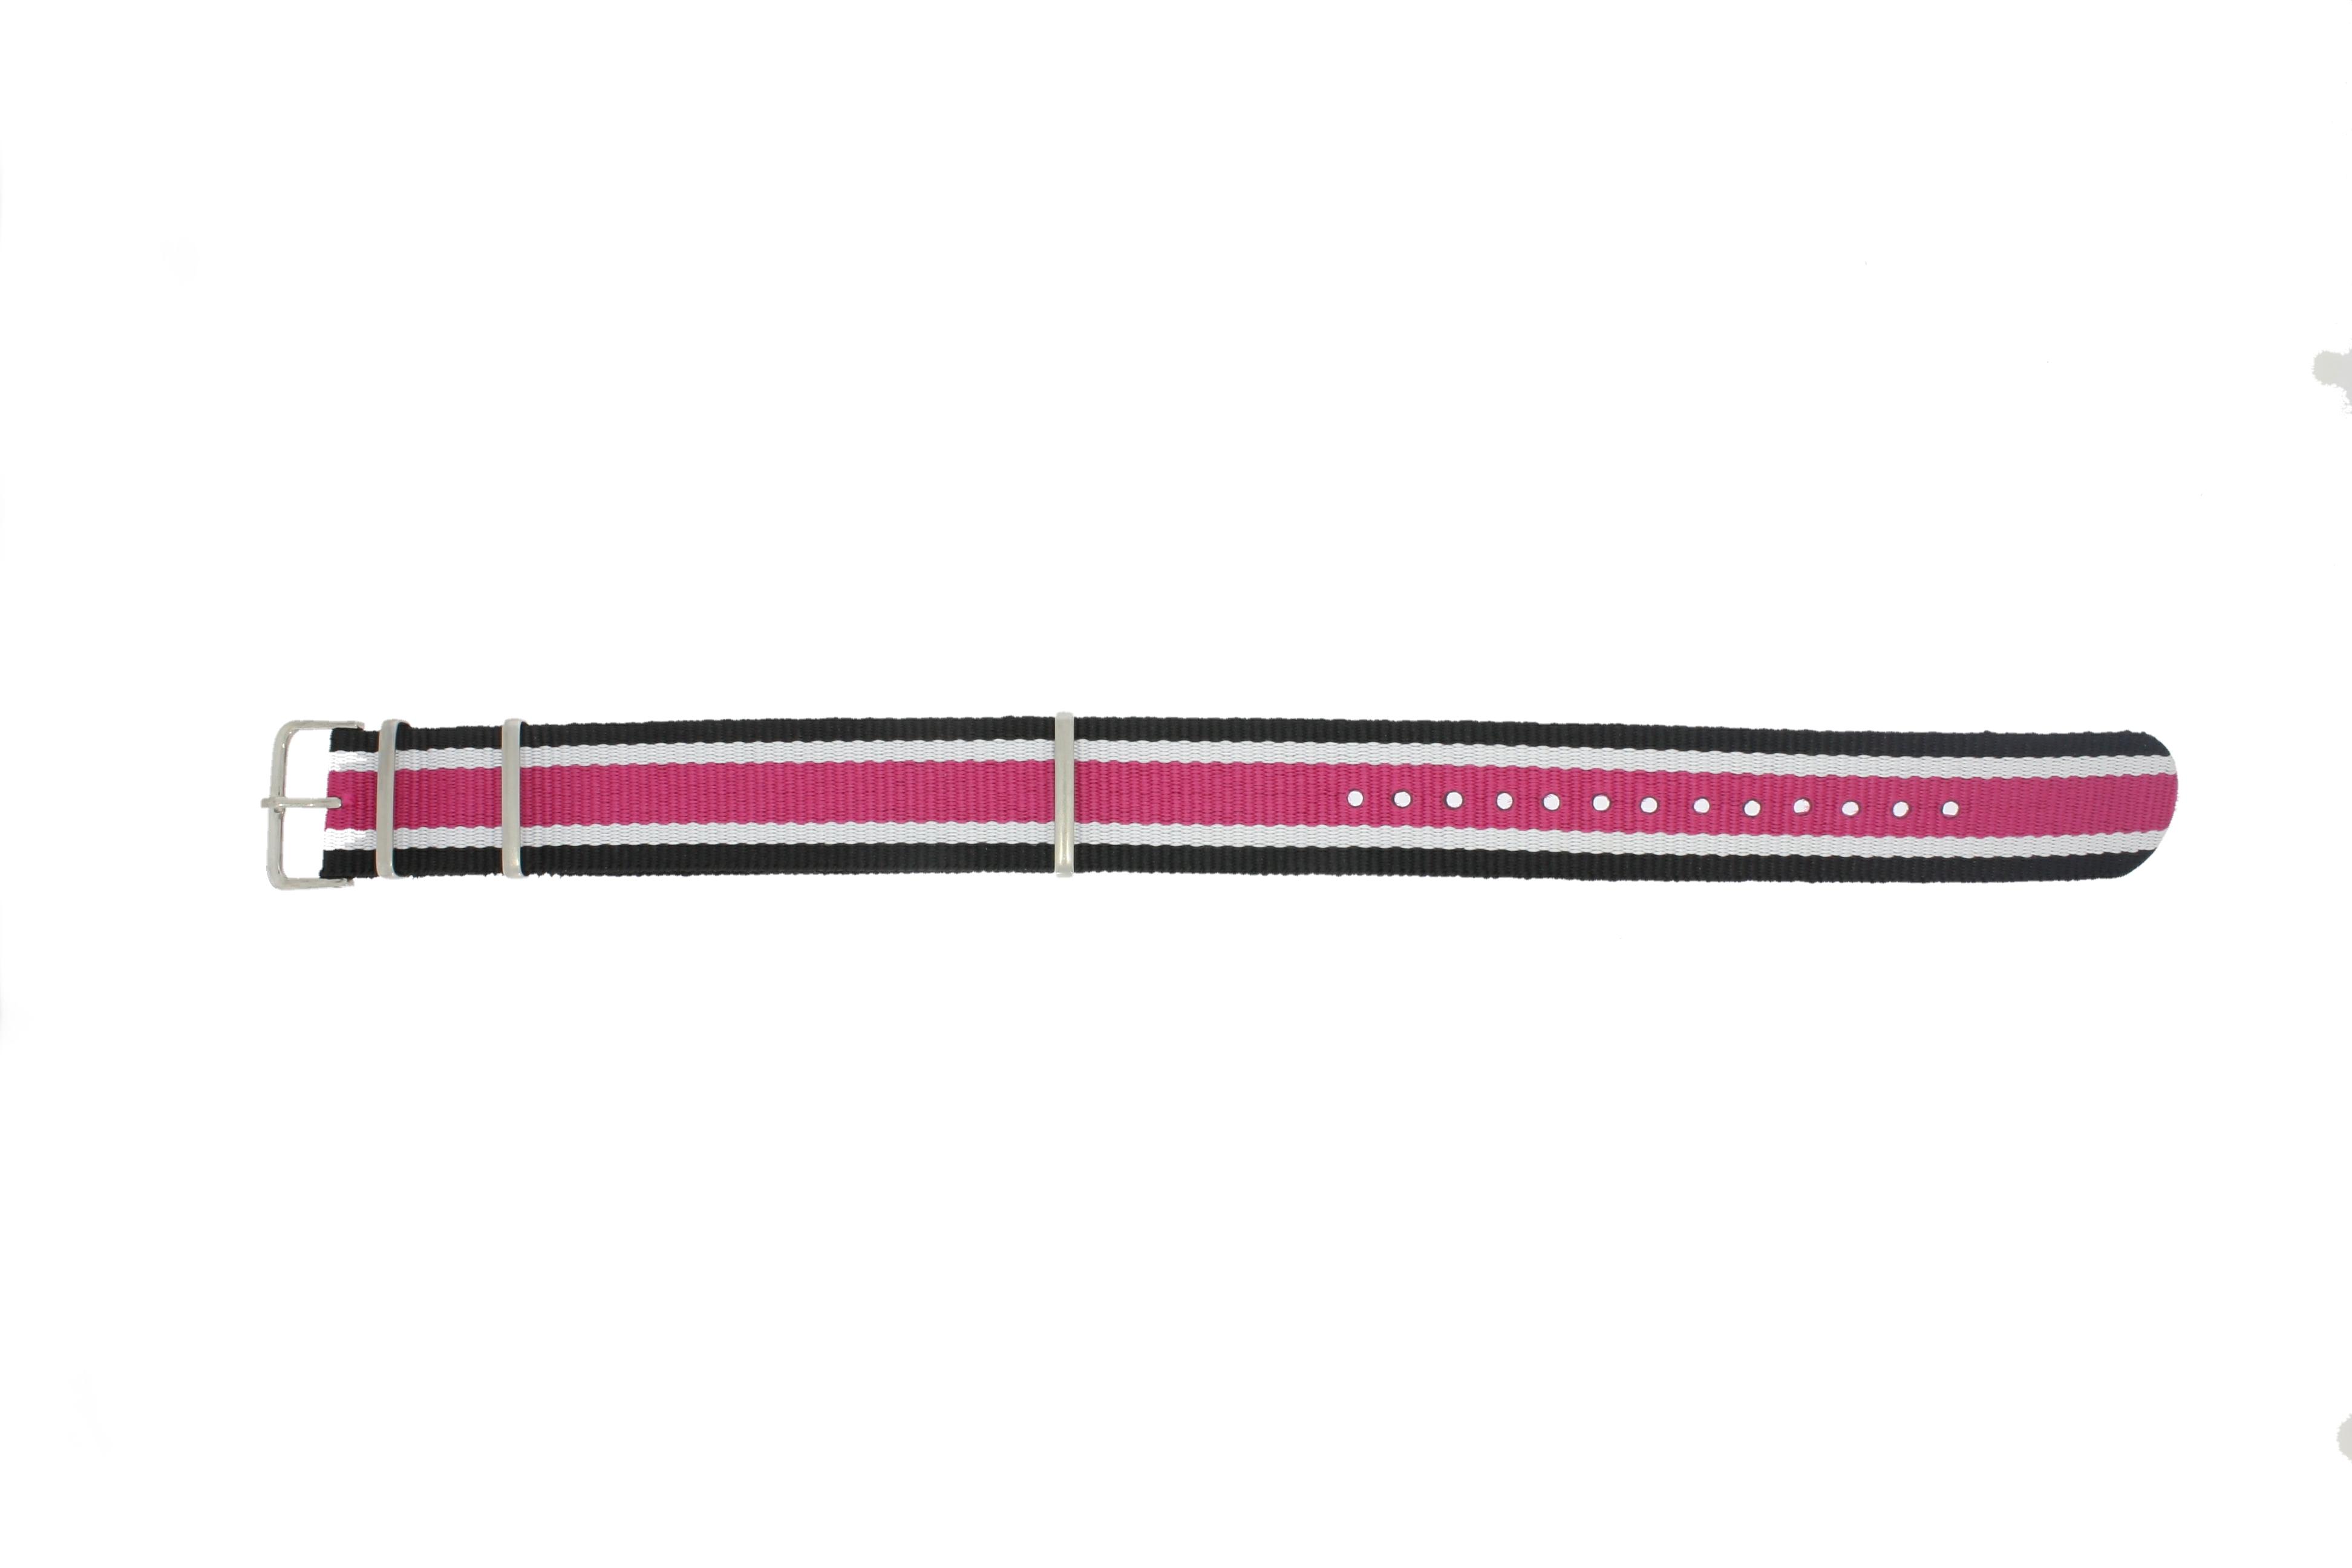 Horlogeband Textiel 22mm Zwart / Wit / Roze MD 1002